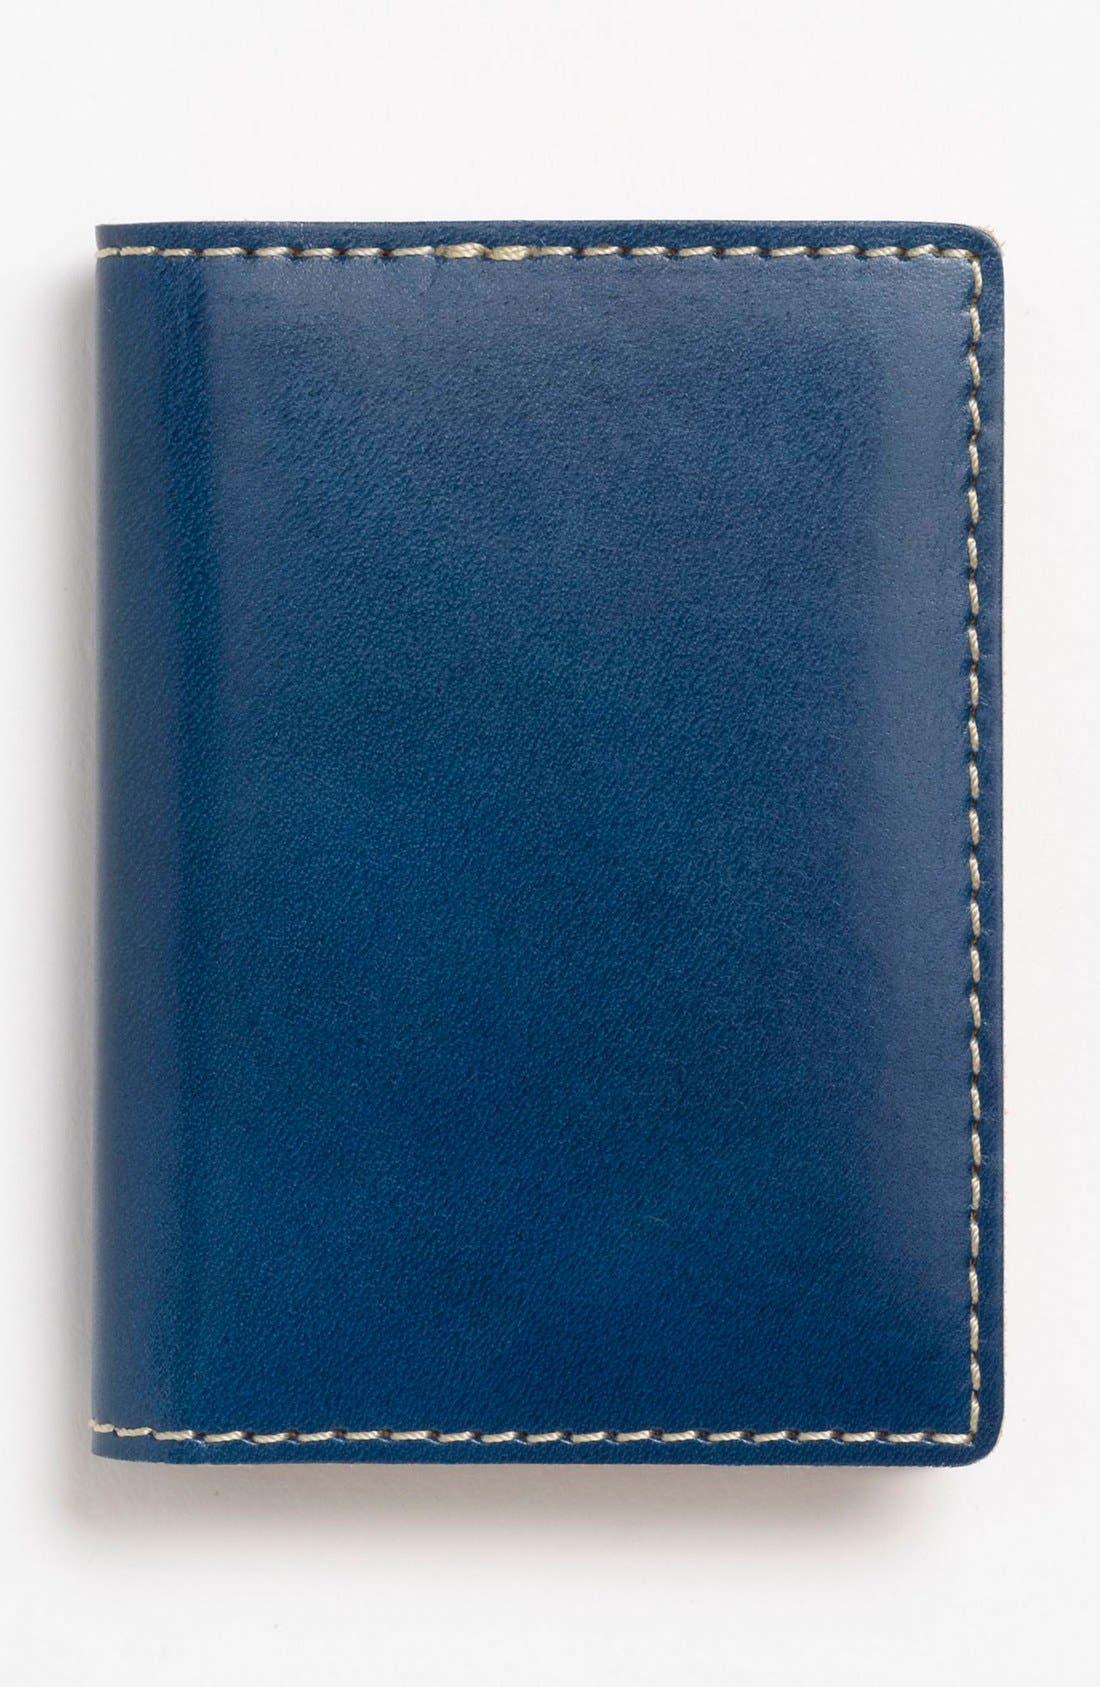 Alternate Image 1 Selected - J Fold 'Superglaze' Folding Card Holder